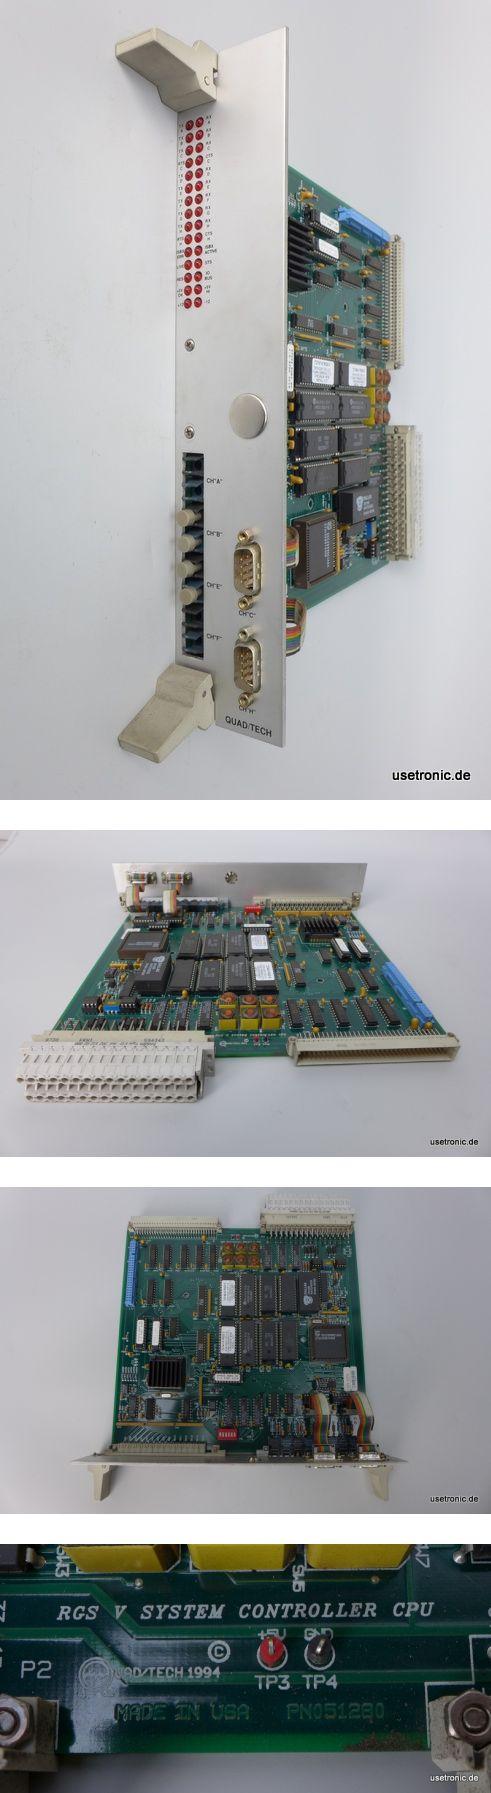 Philips KS 4580 Industrieregler Temperaturregler